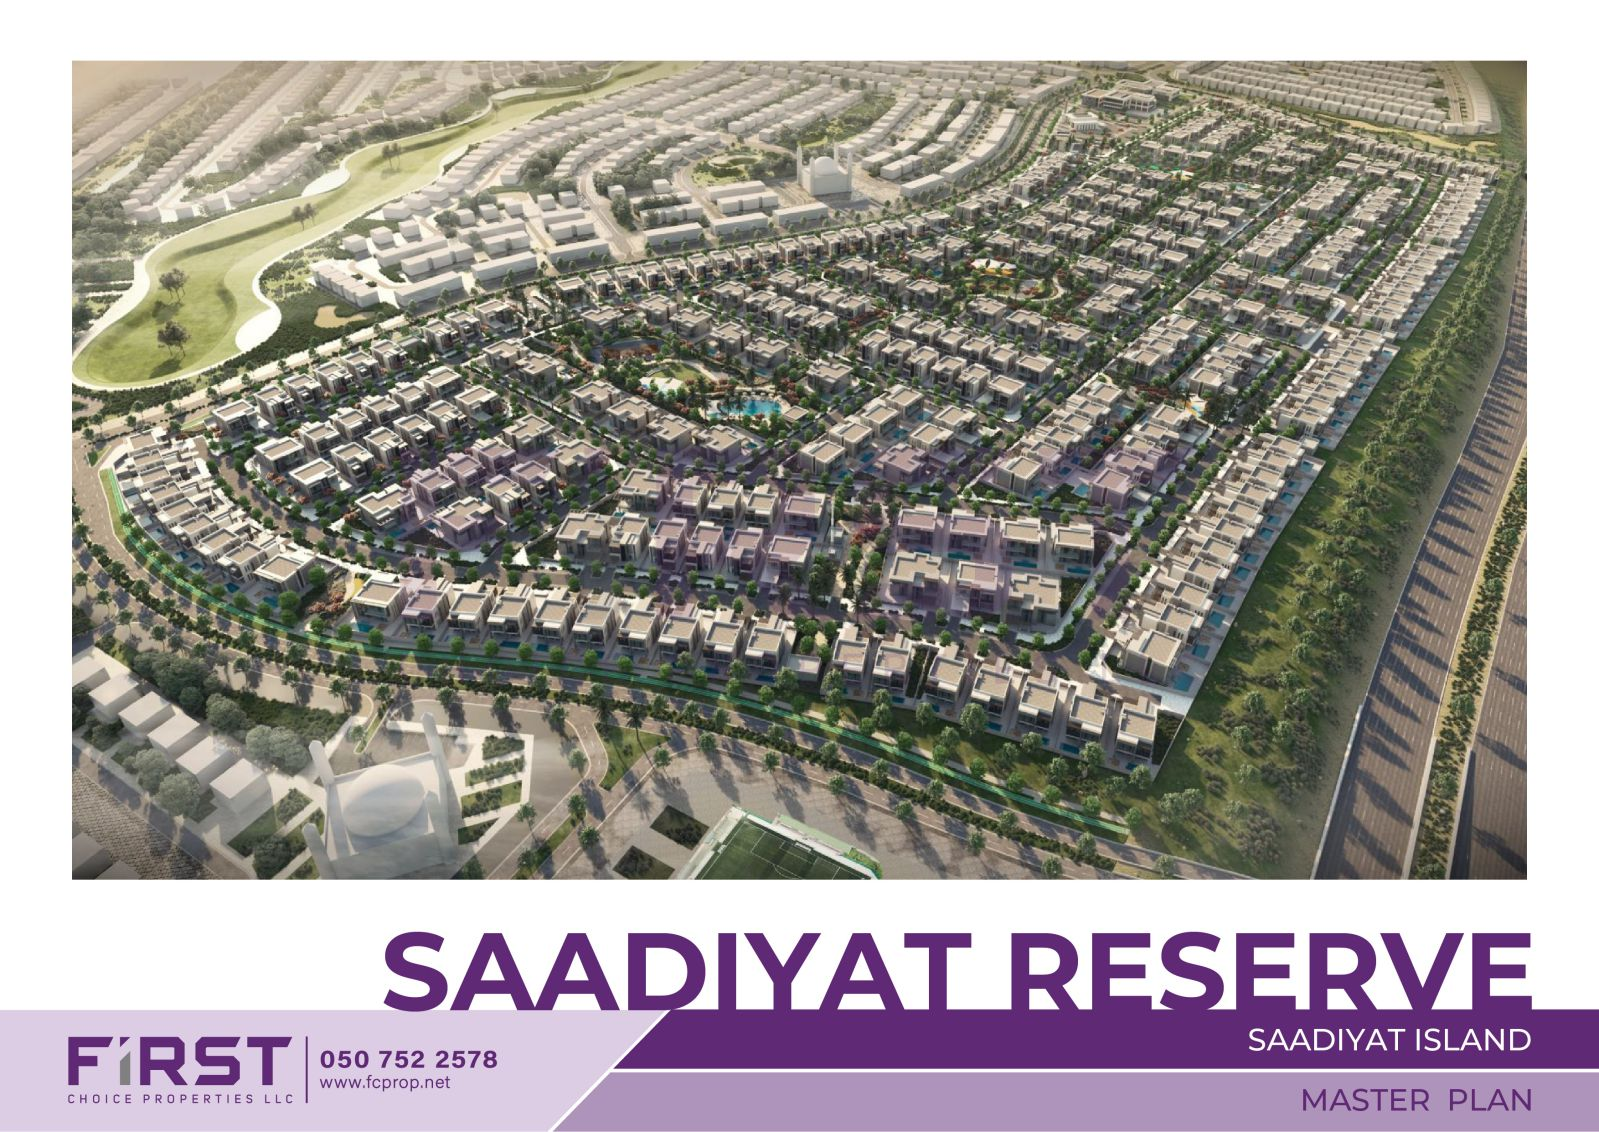 Master Plan of Saadiyat Reserve Saadiyat Island Abu Dhabi UAE.jpg